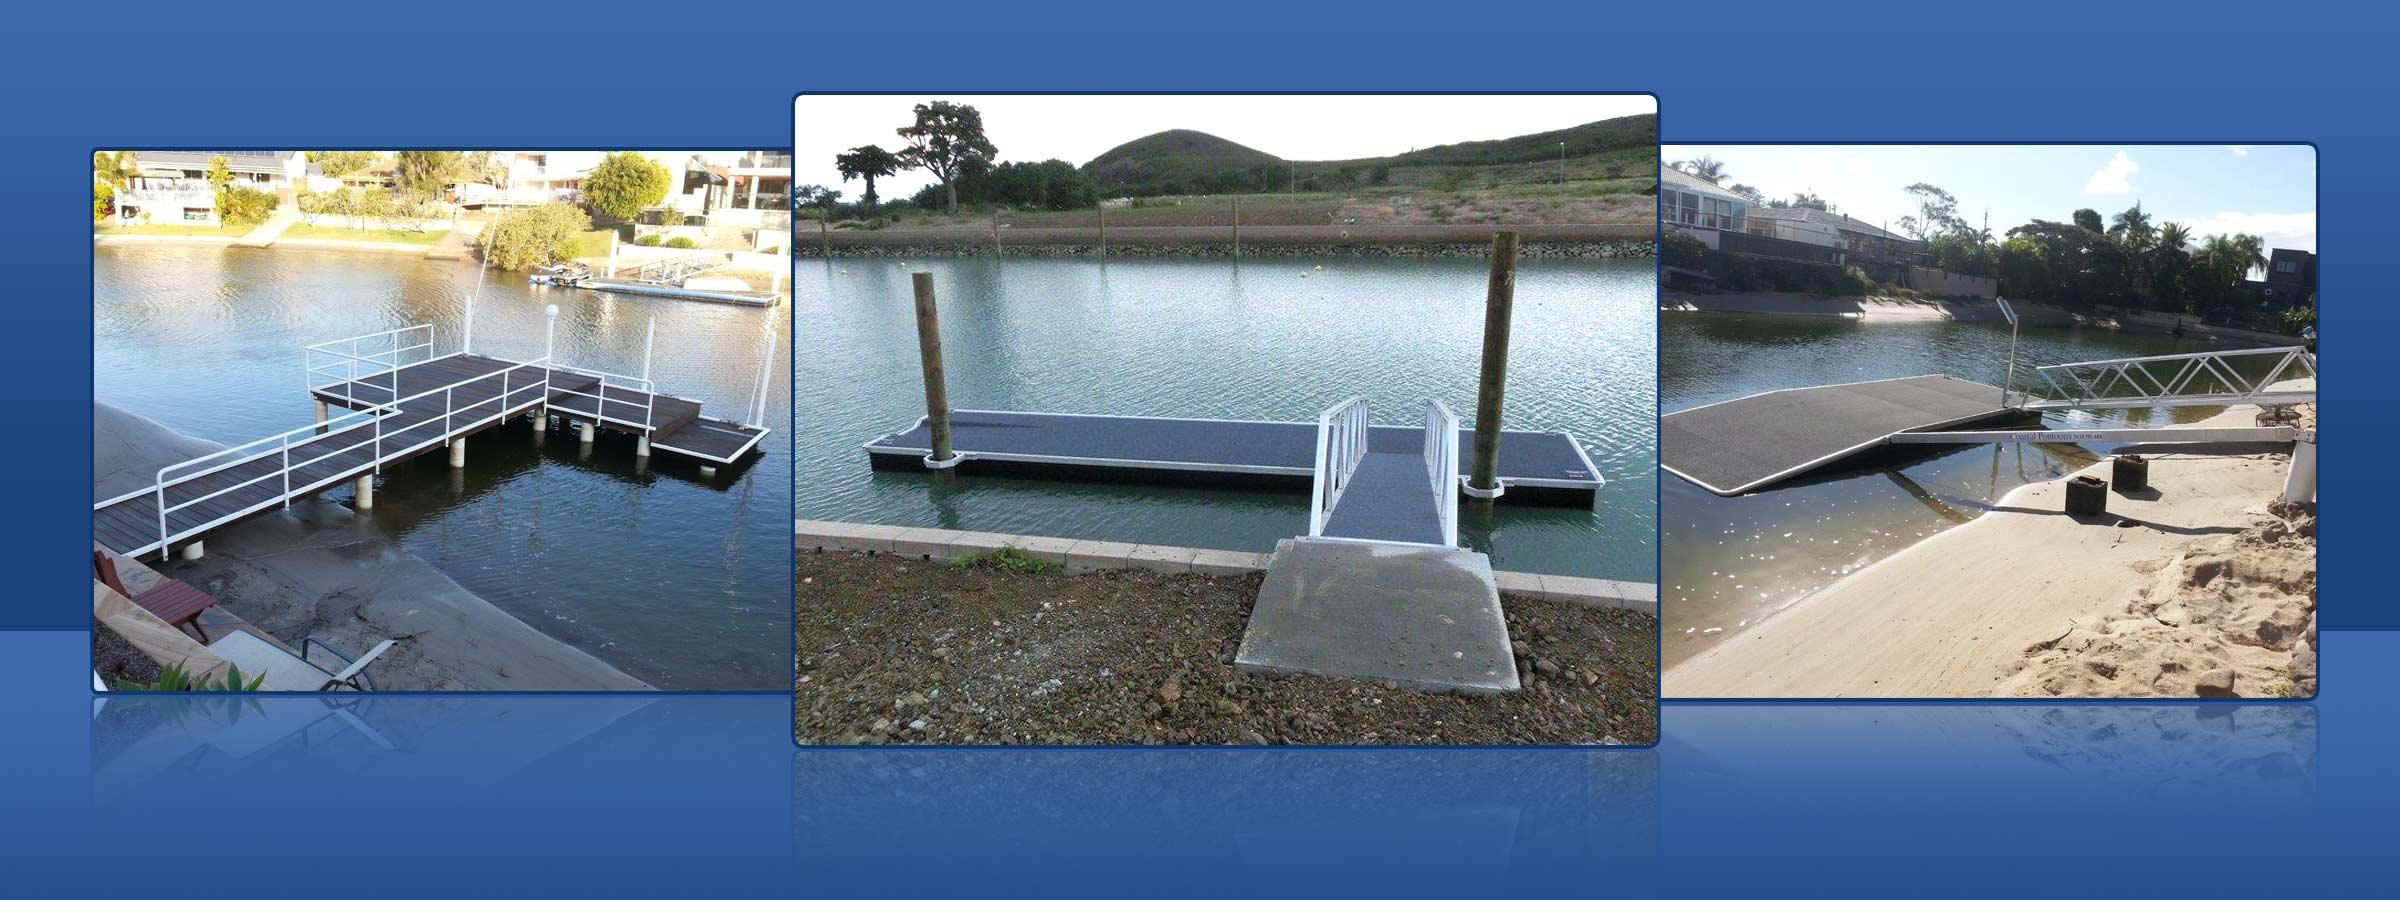 coastal pontoon and jetty repairs newly built jetty and pontoon